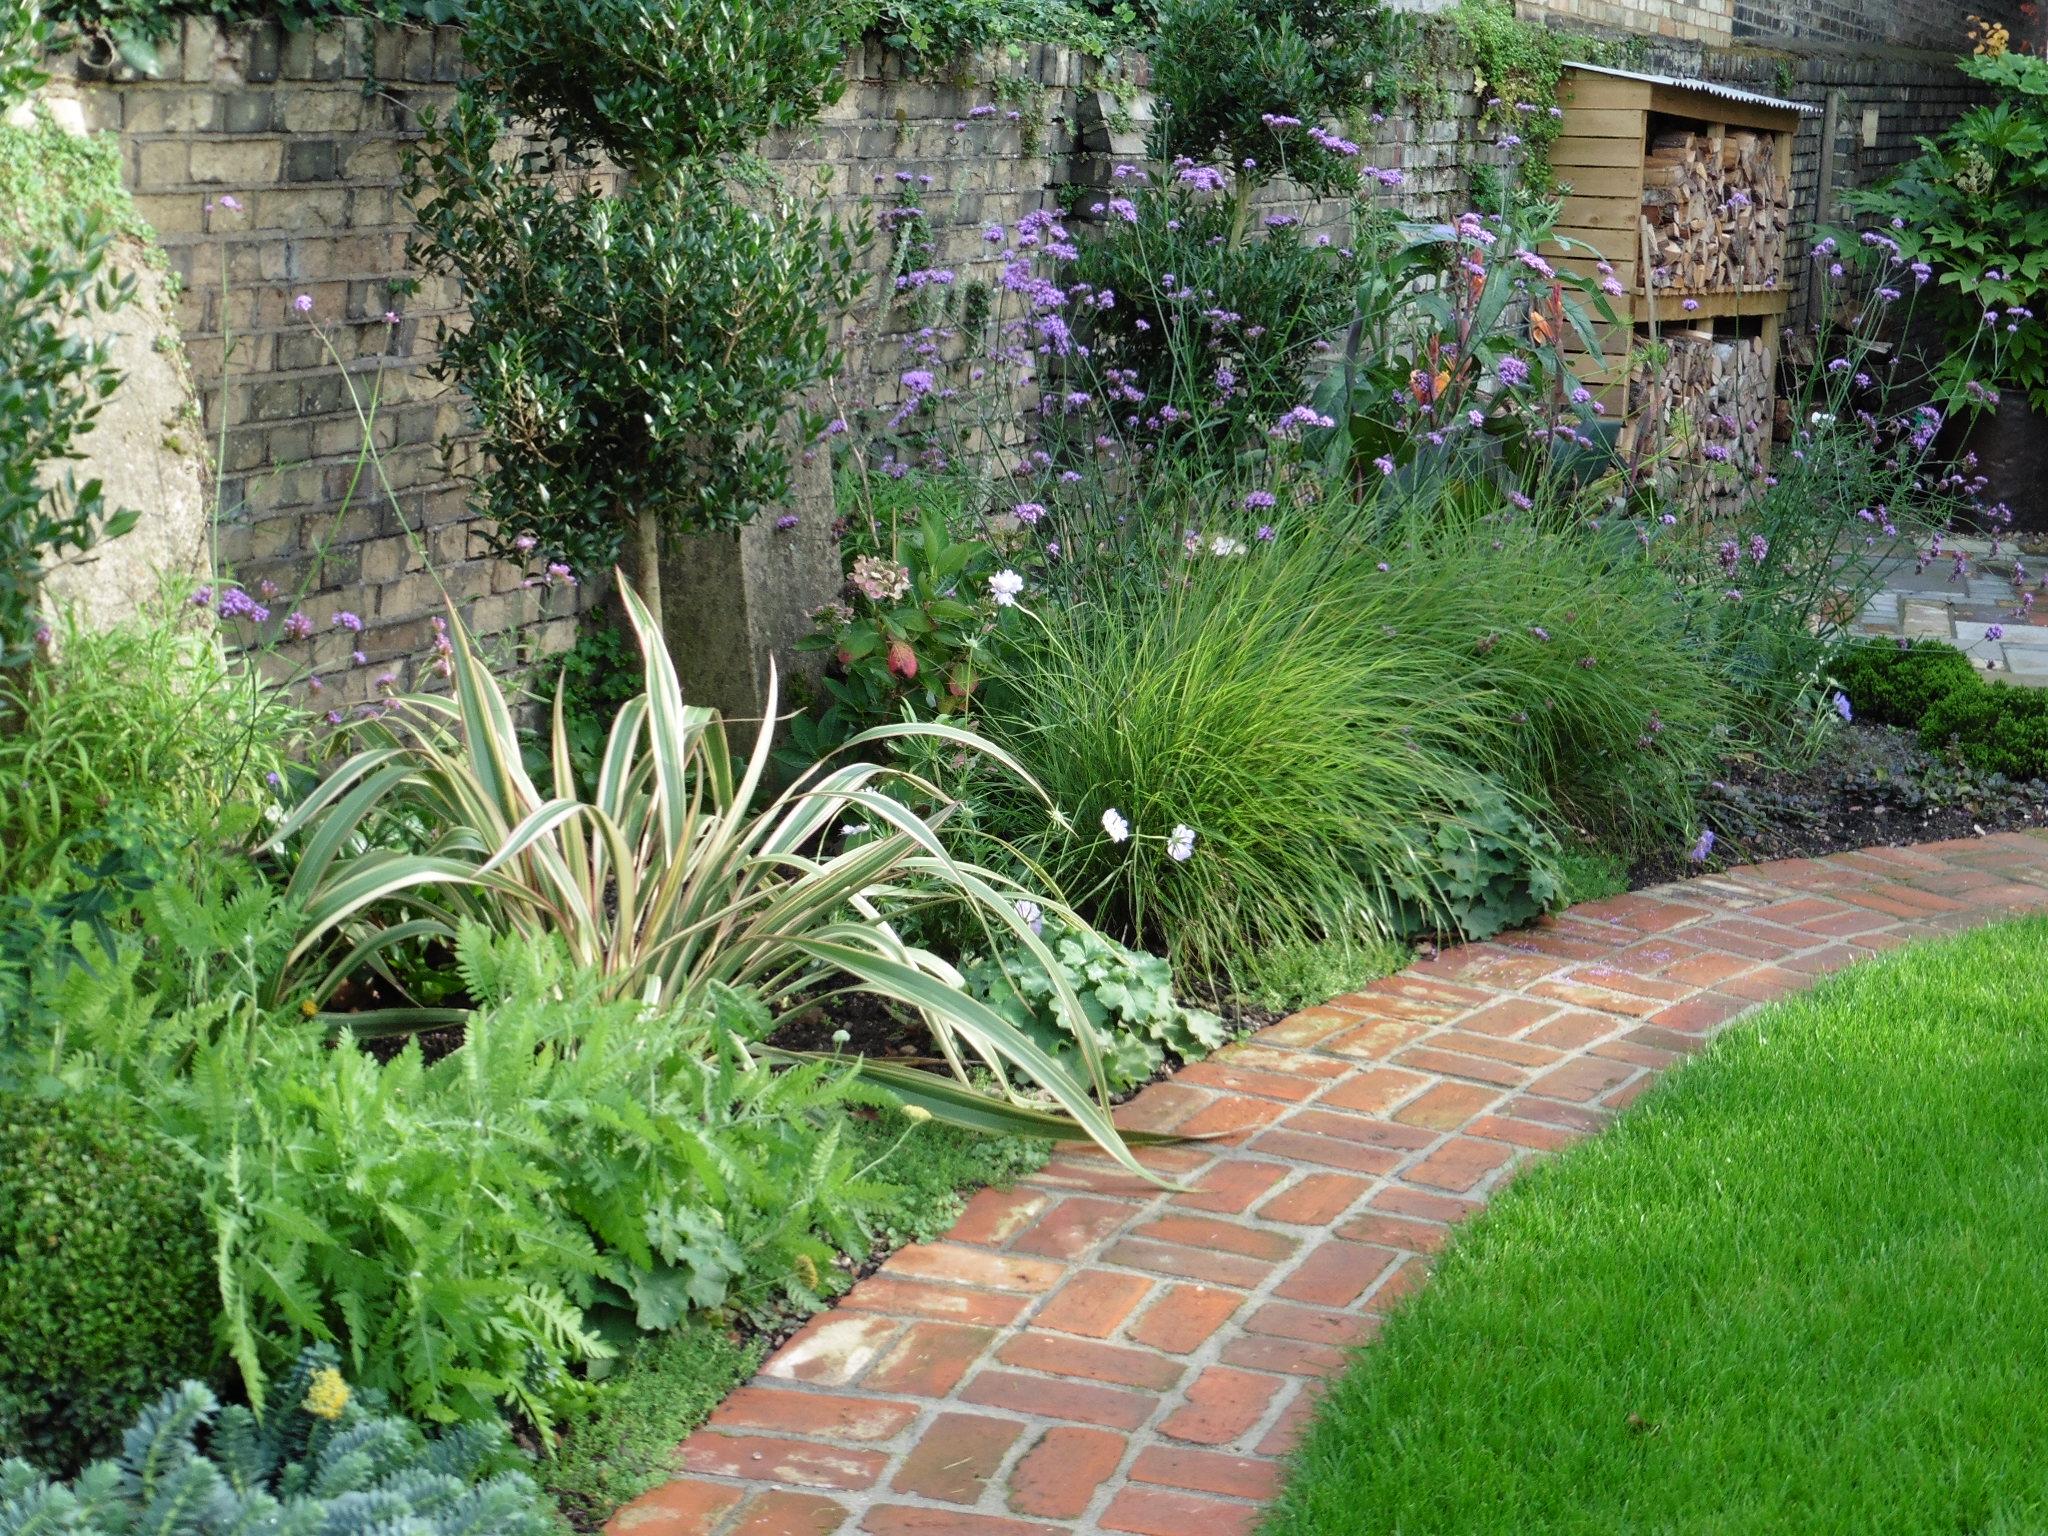 Helen riches garden design and writing for Award winning patio designs